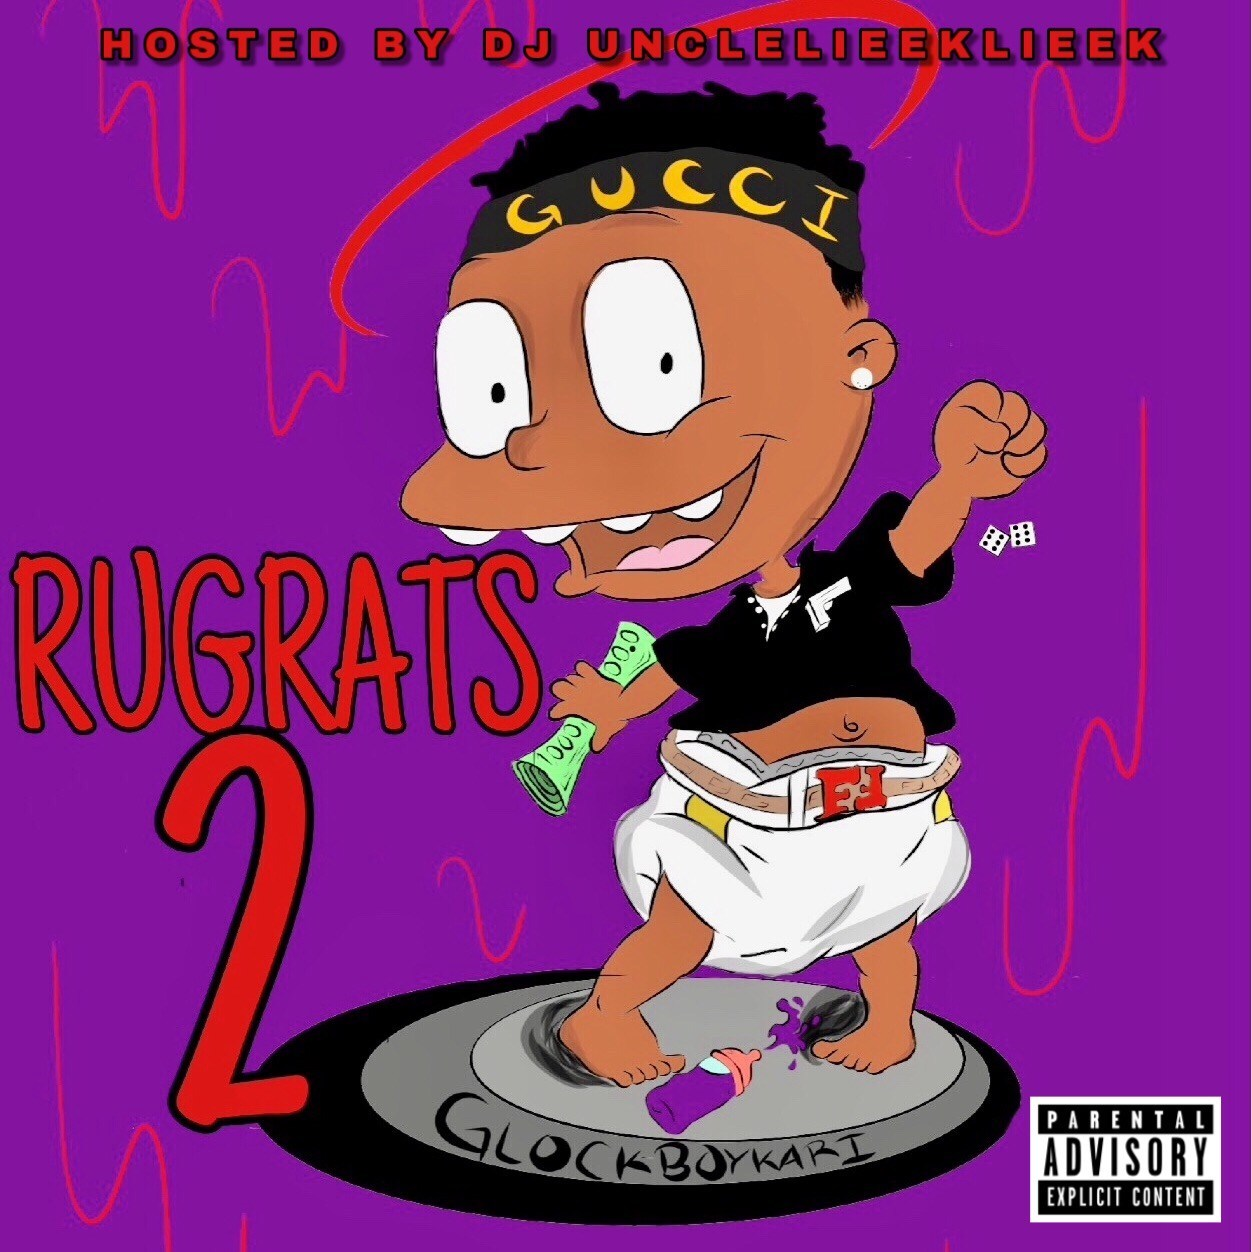 GlockBoyKari – 'Rugrats 2' (Stream)